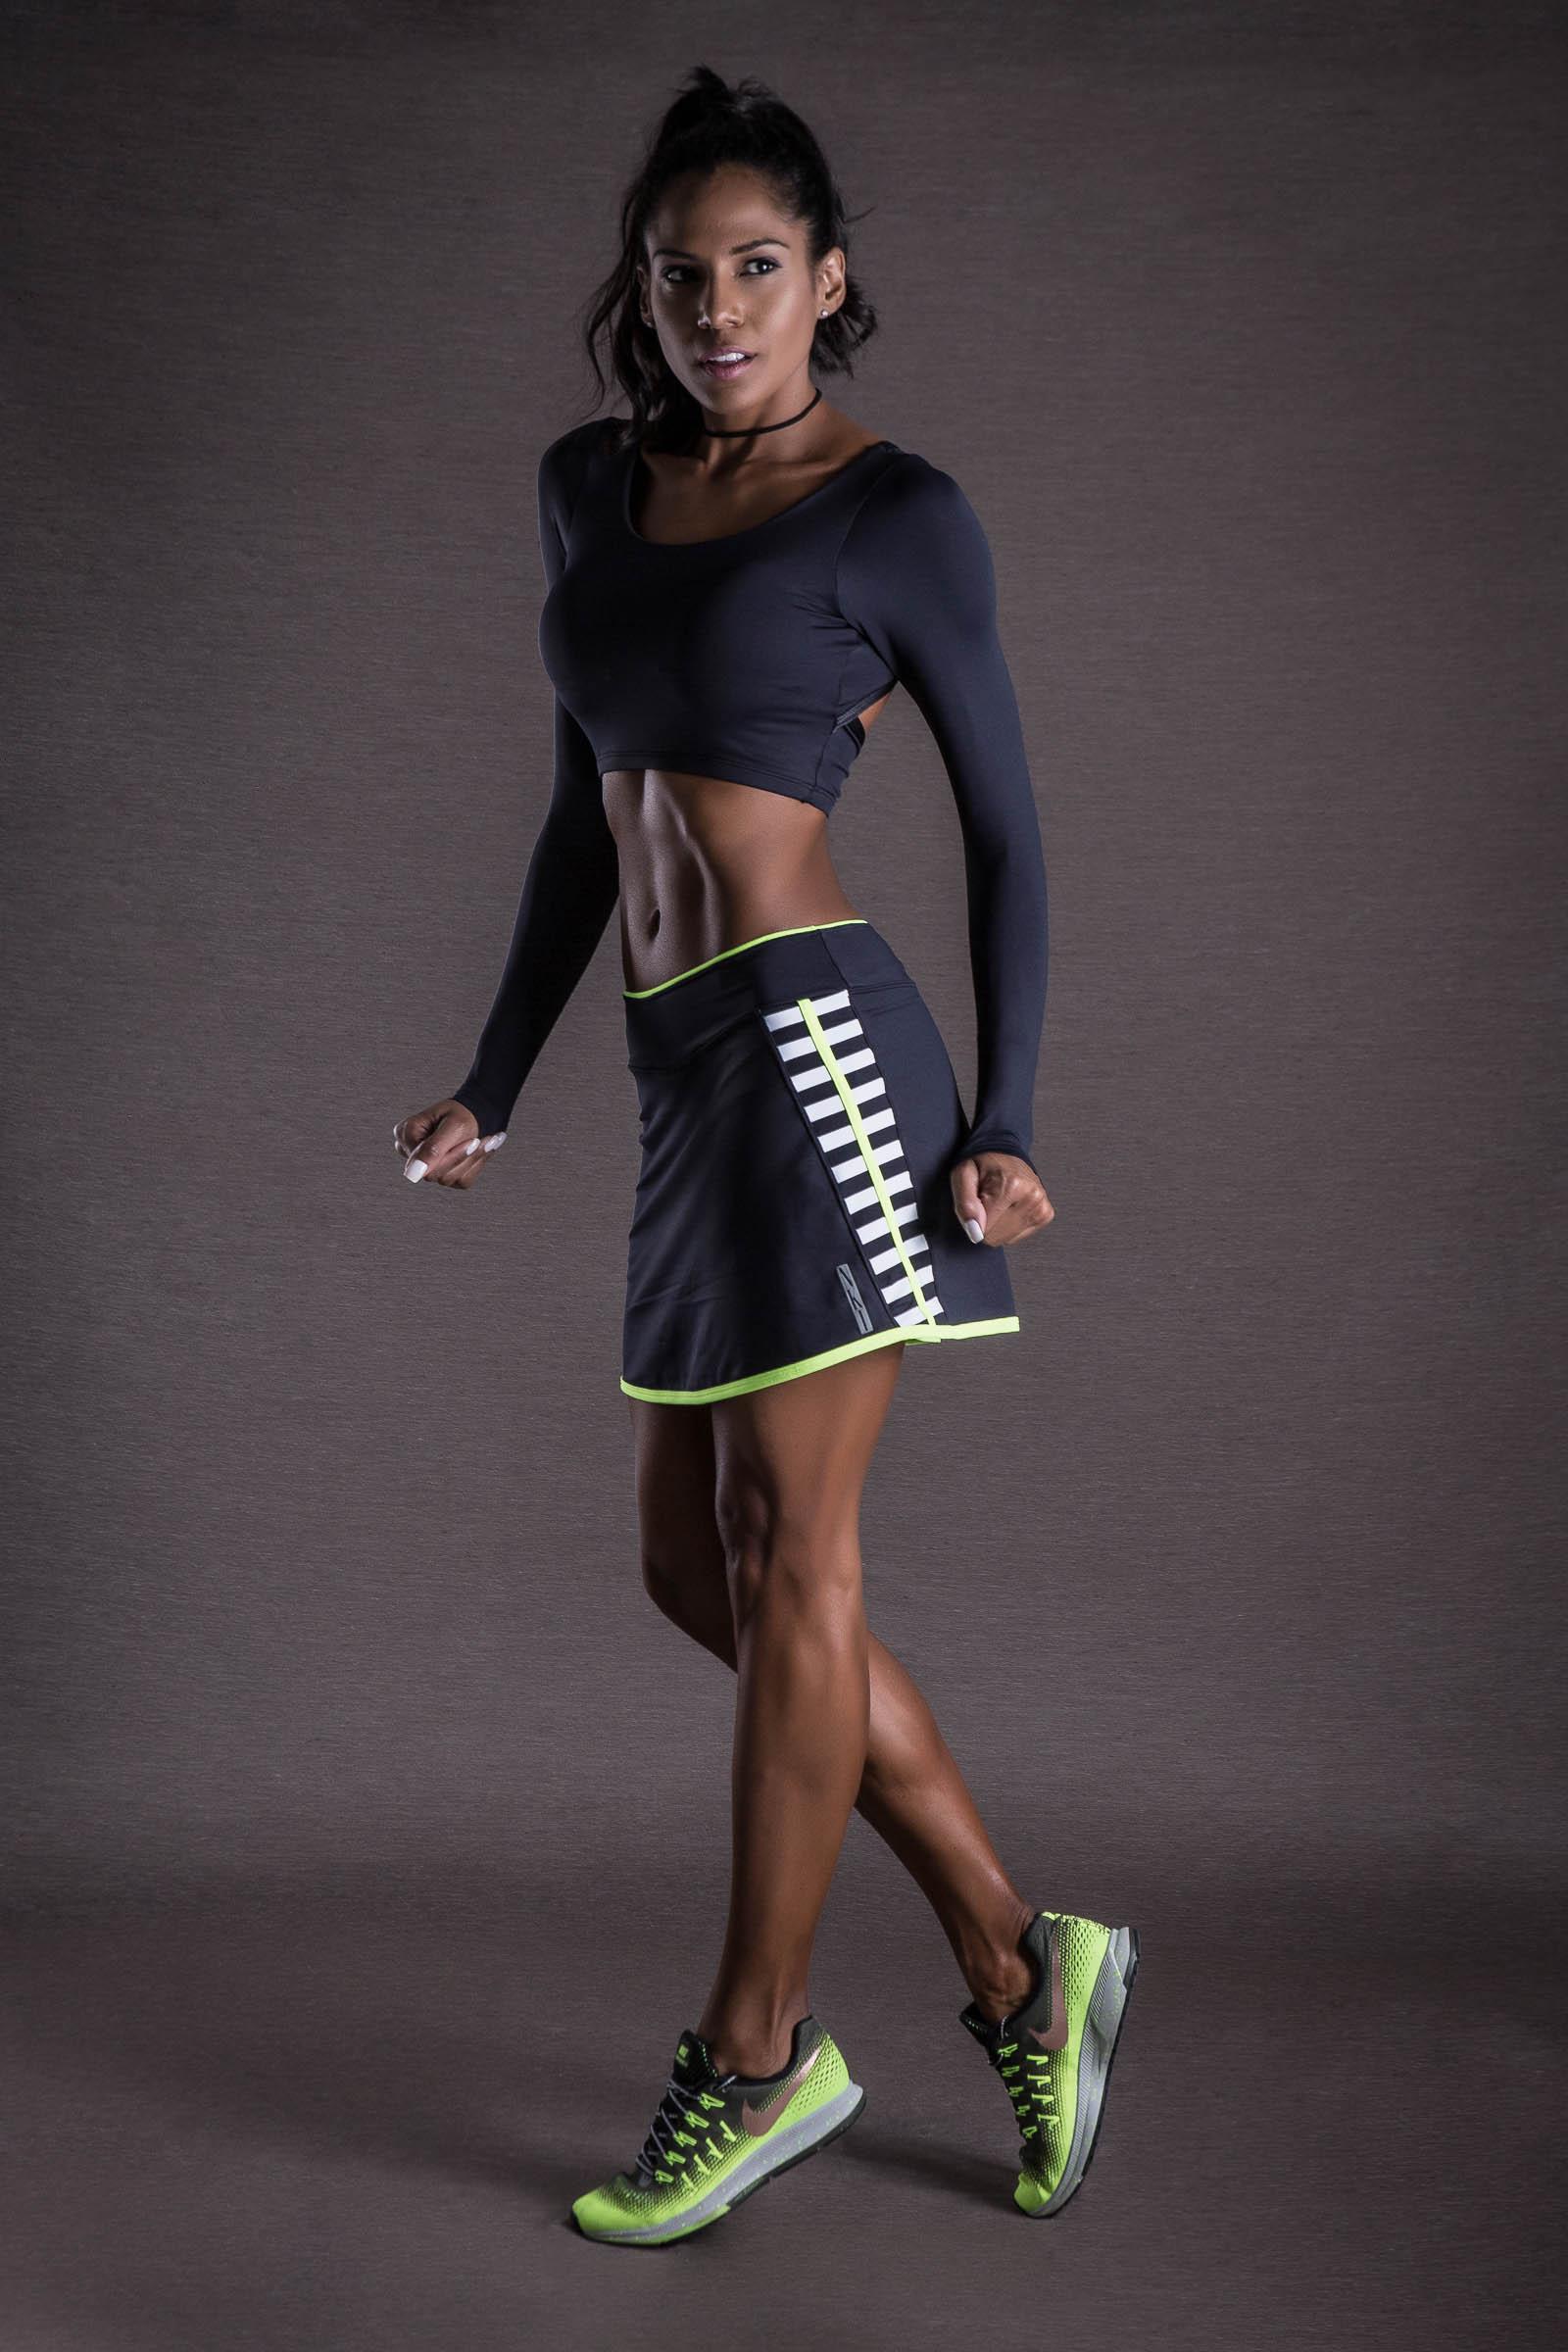 Saia Shorts Can Neon, Coleção You can - NKT Fitwear Moda Fitness